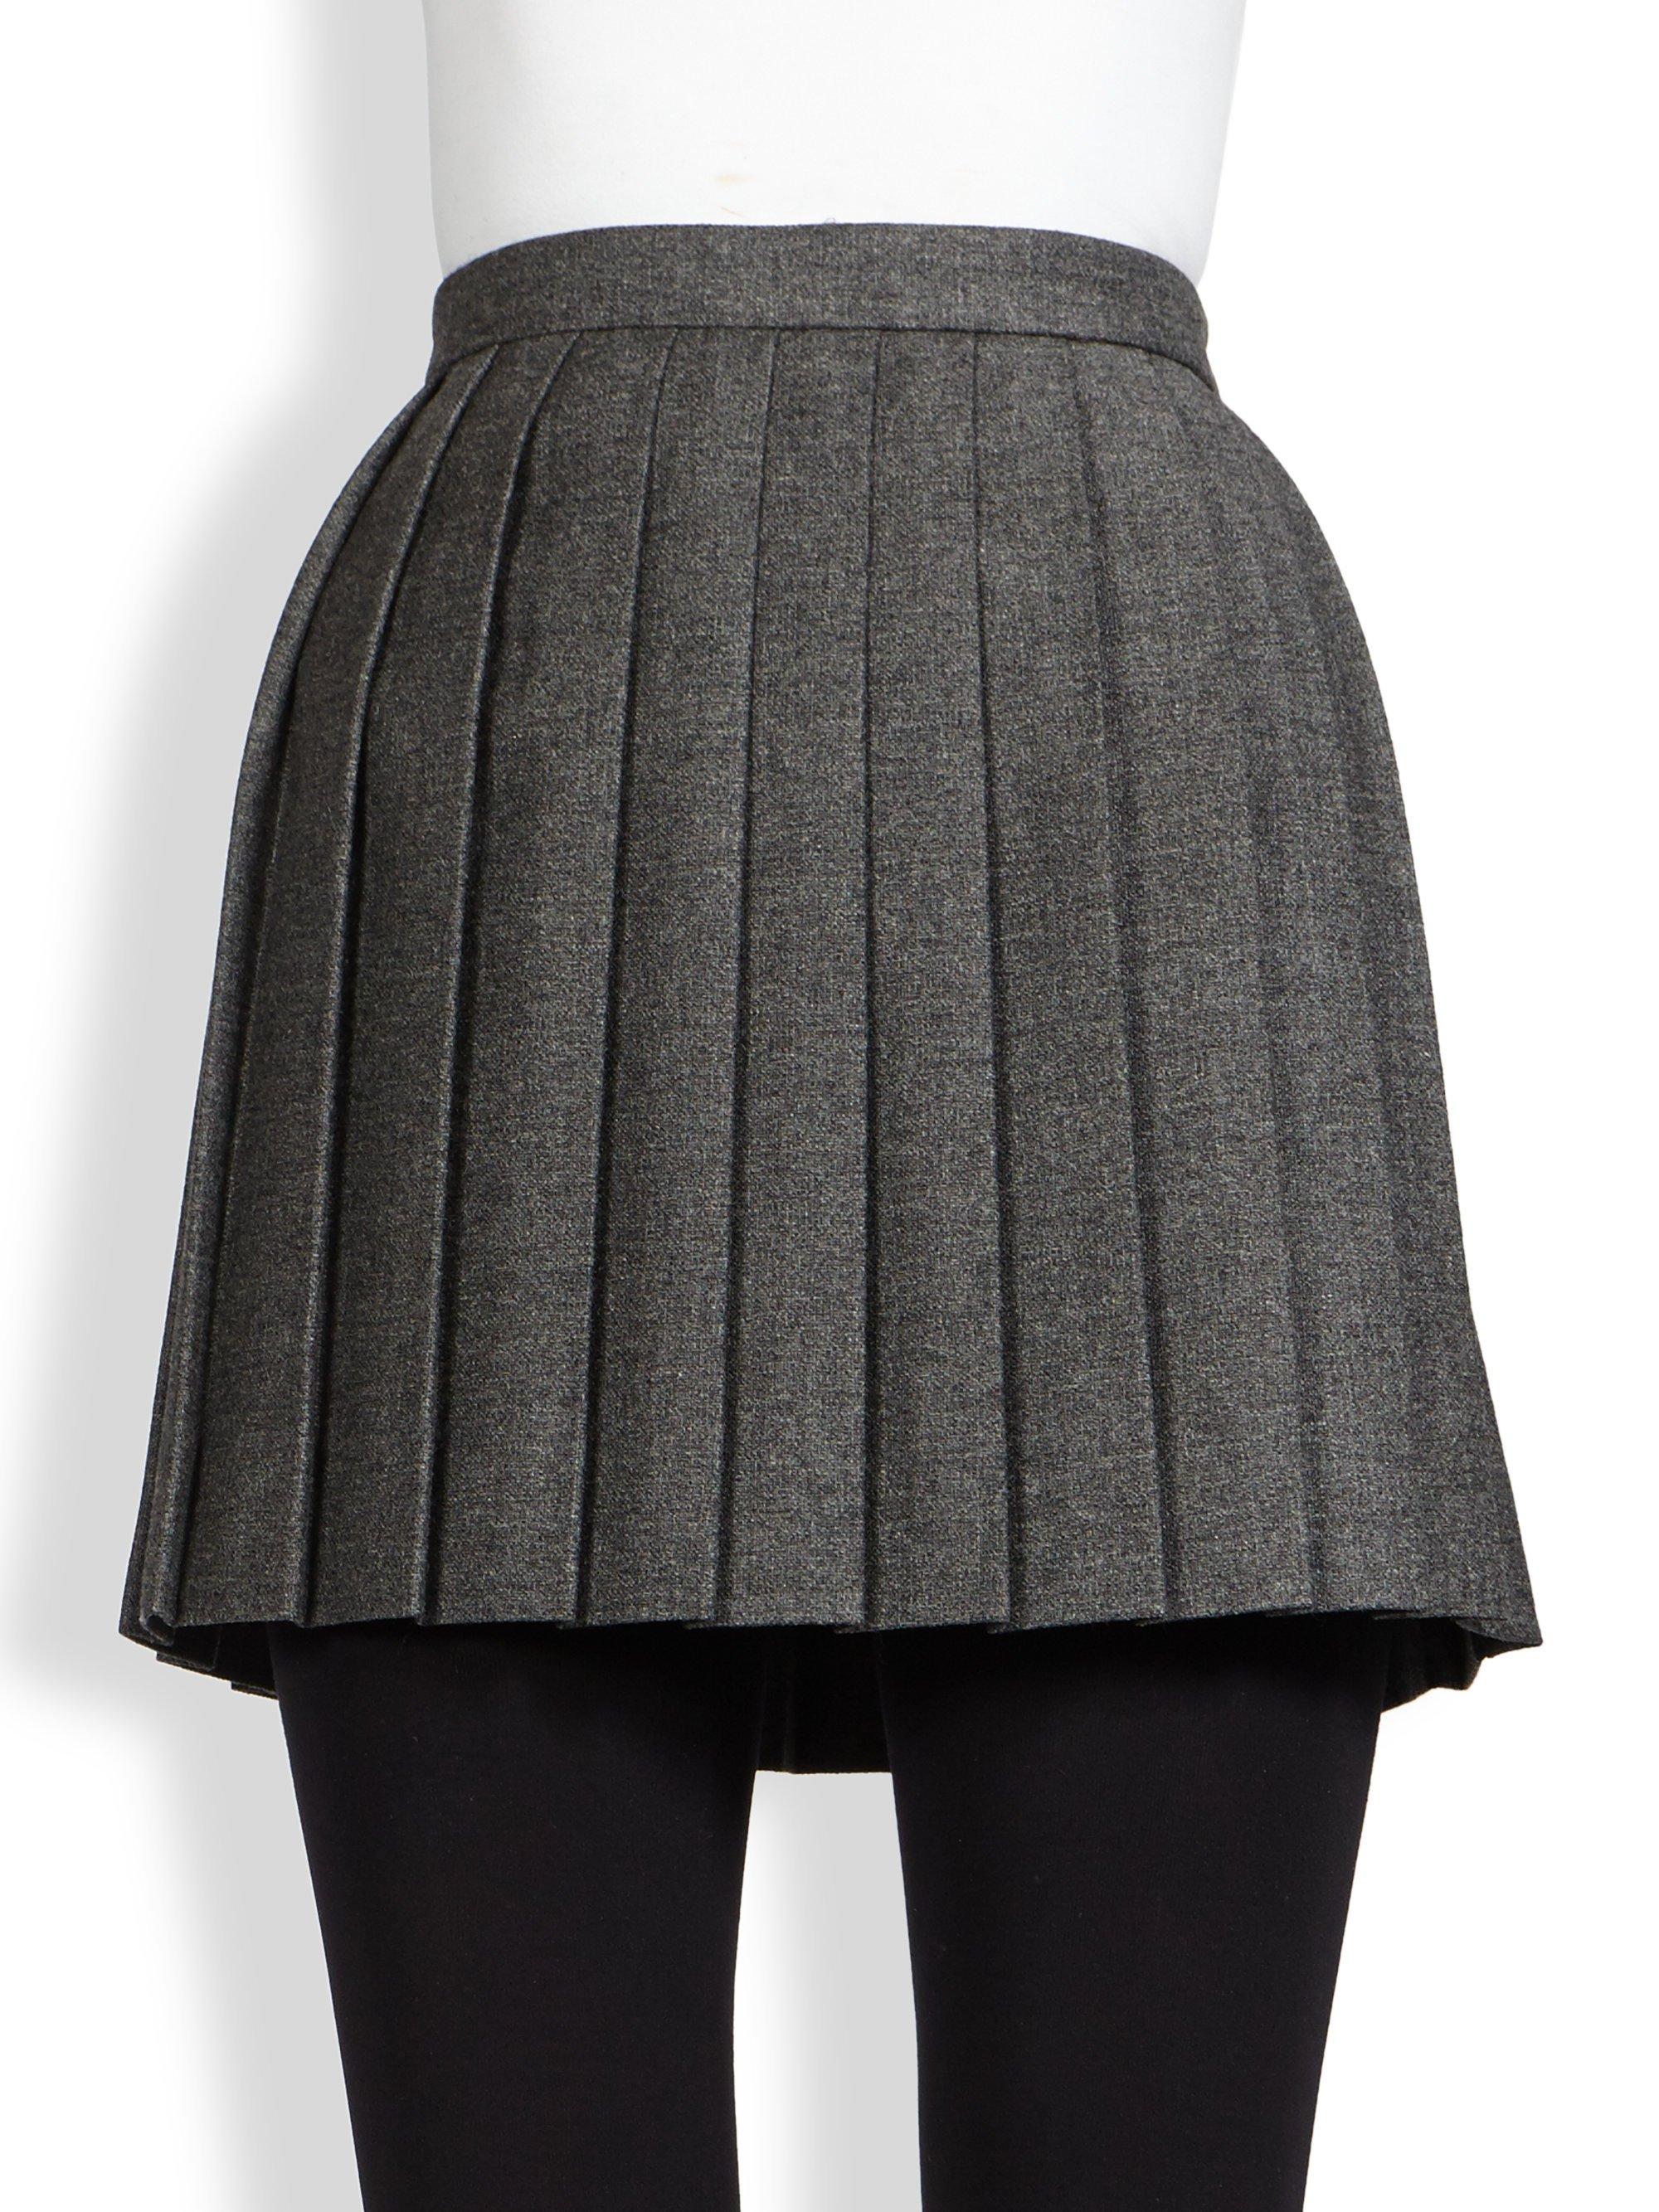 Saint laurent Pleated Wool Mini Skirt in Gray | Lyst